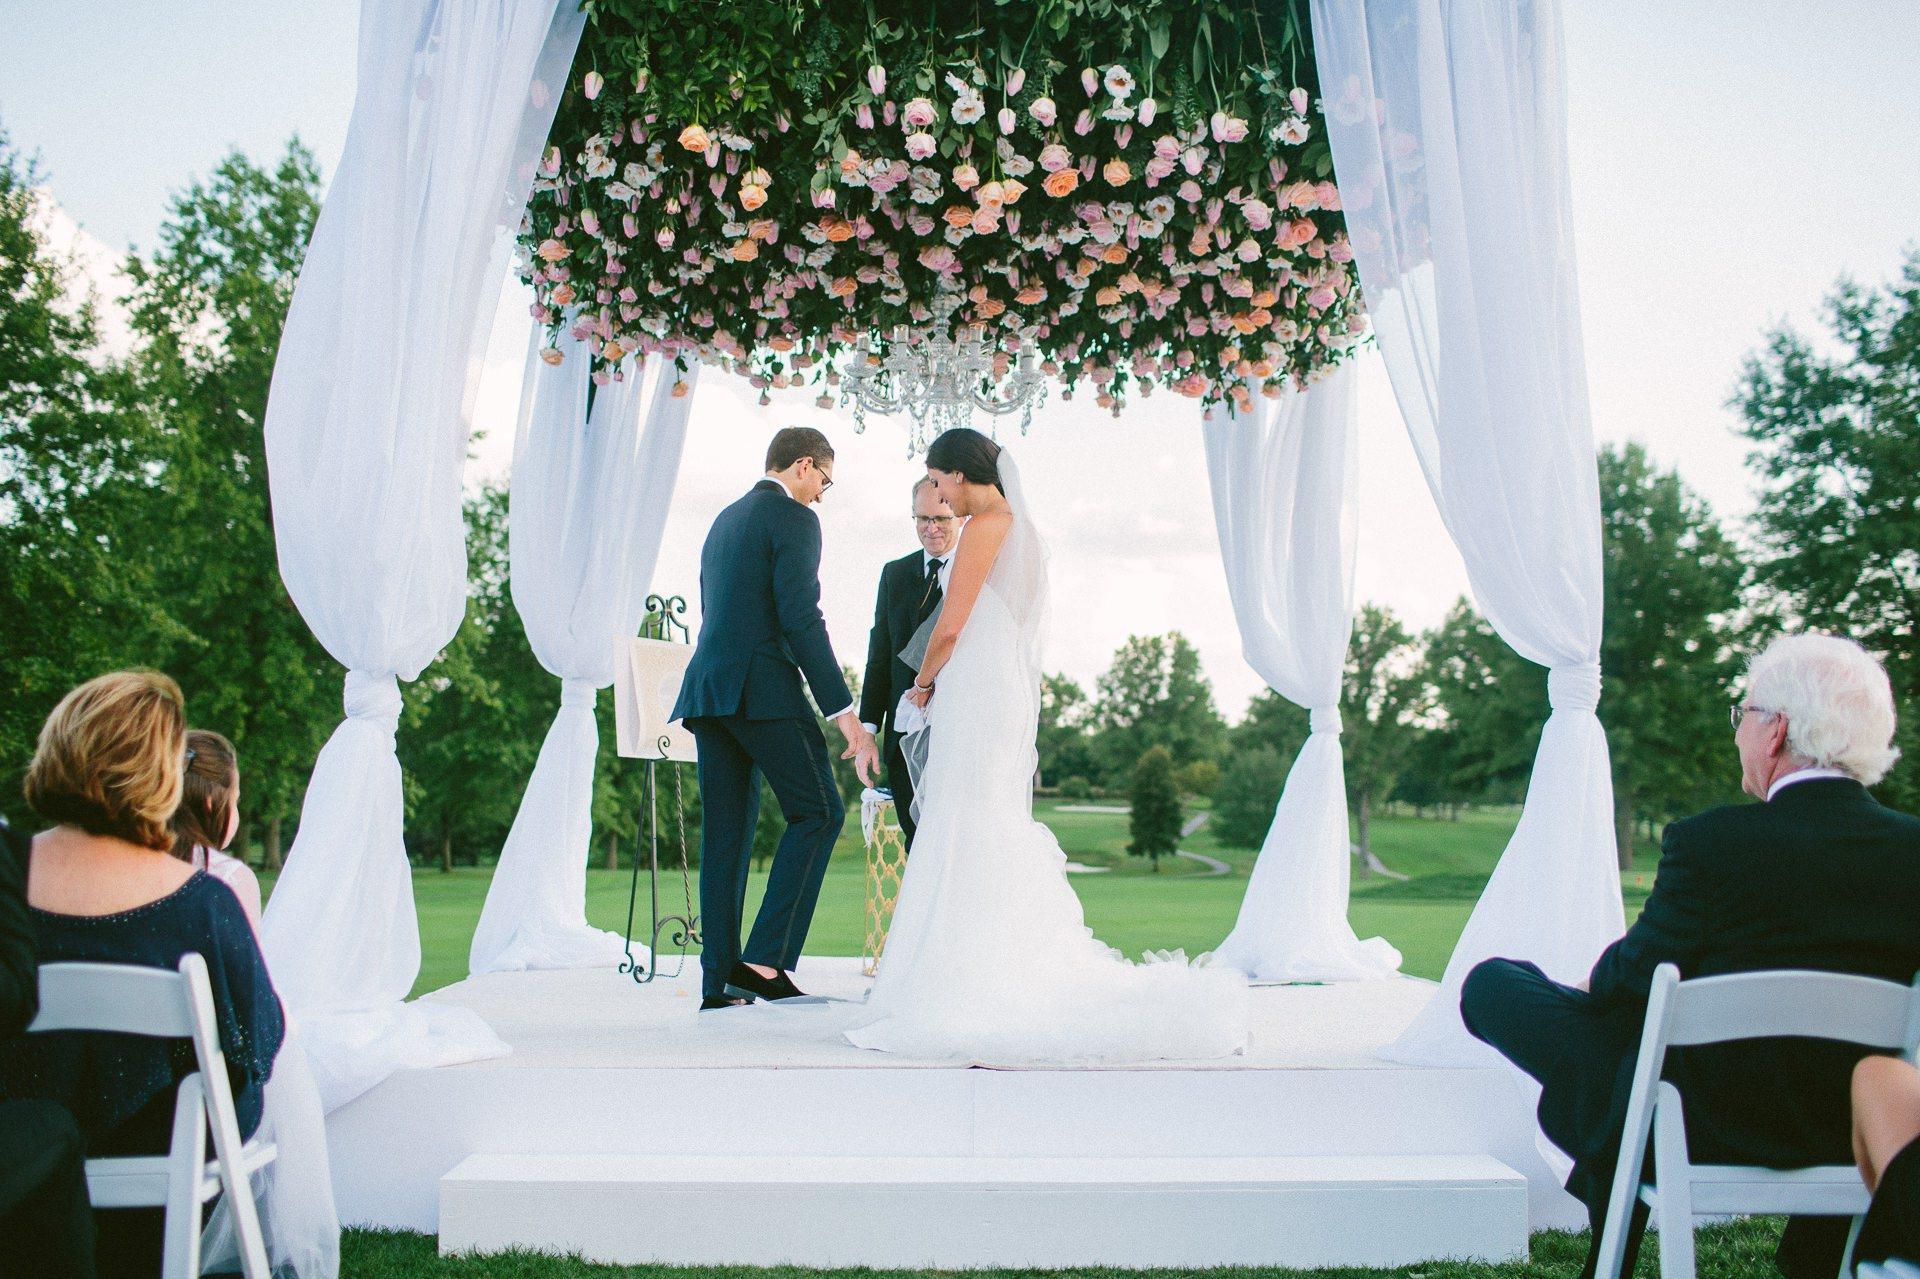 Beechmont Country Club Wedding Photographer in Beachwood 2 33.jpg